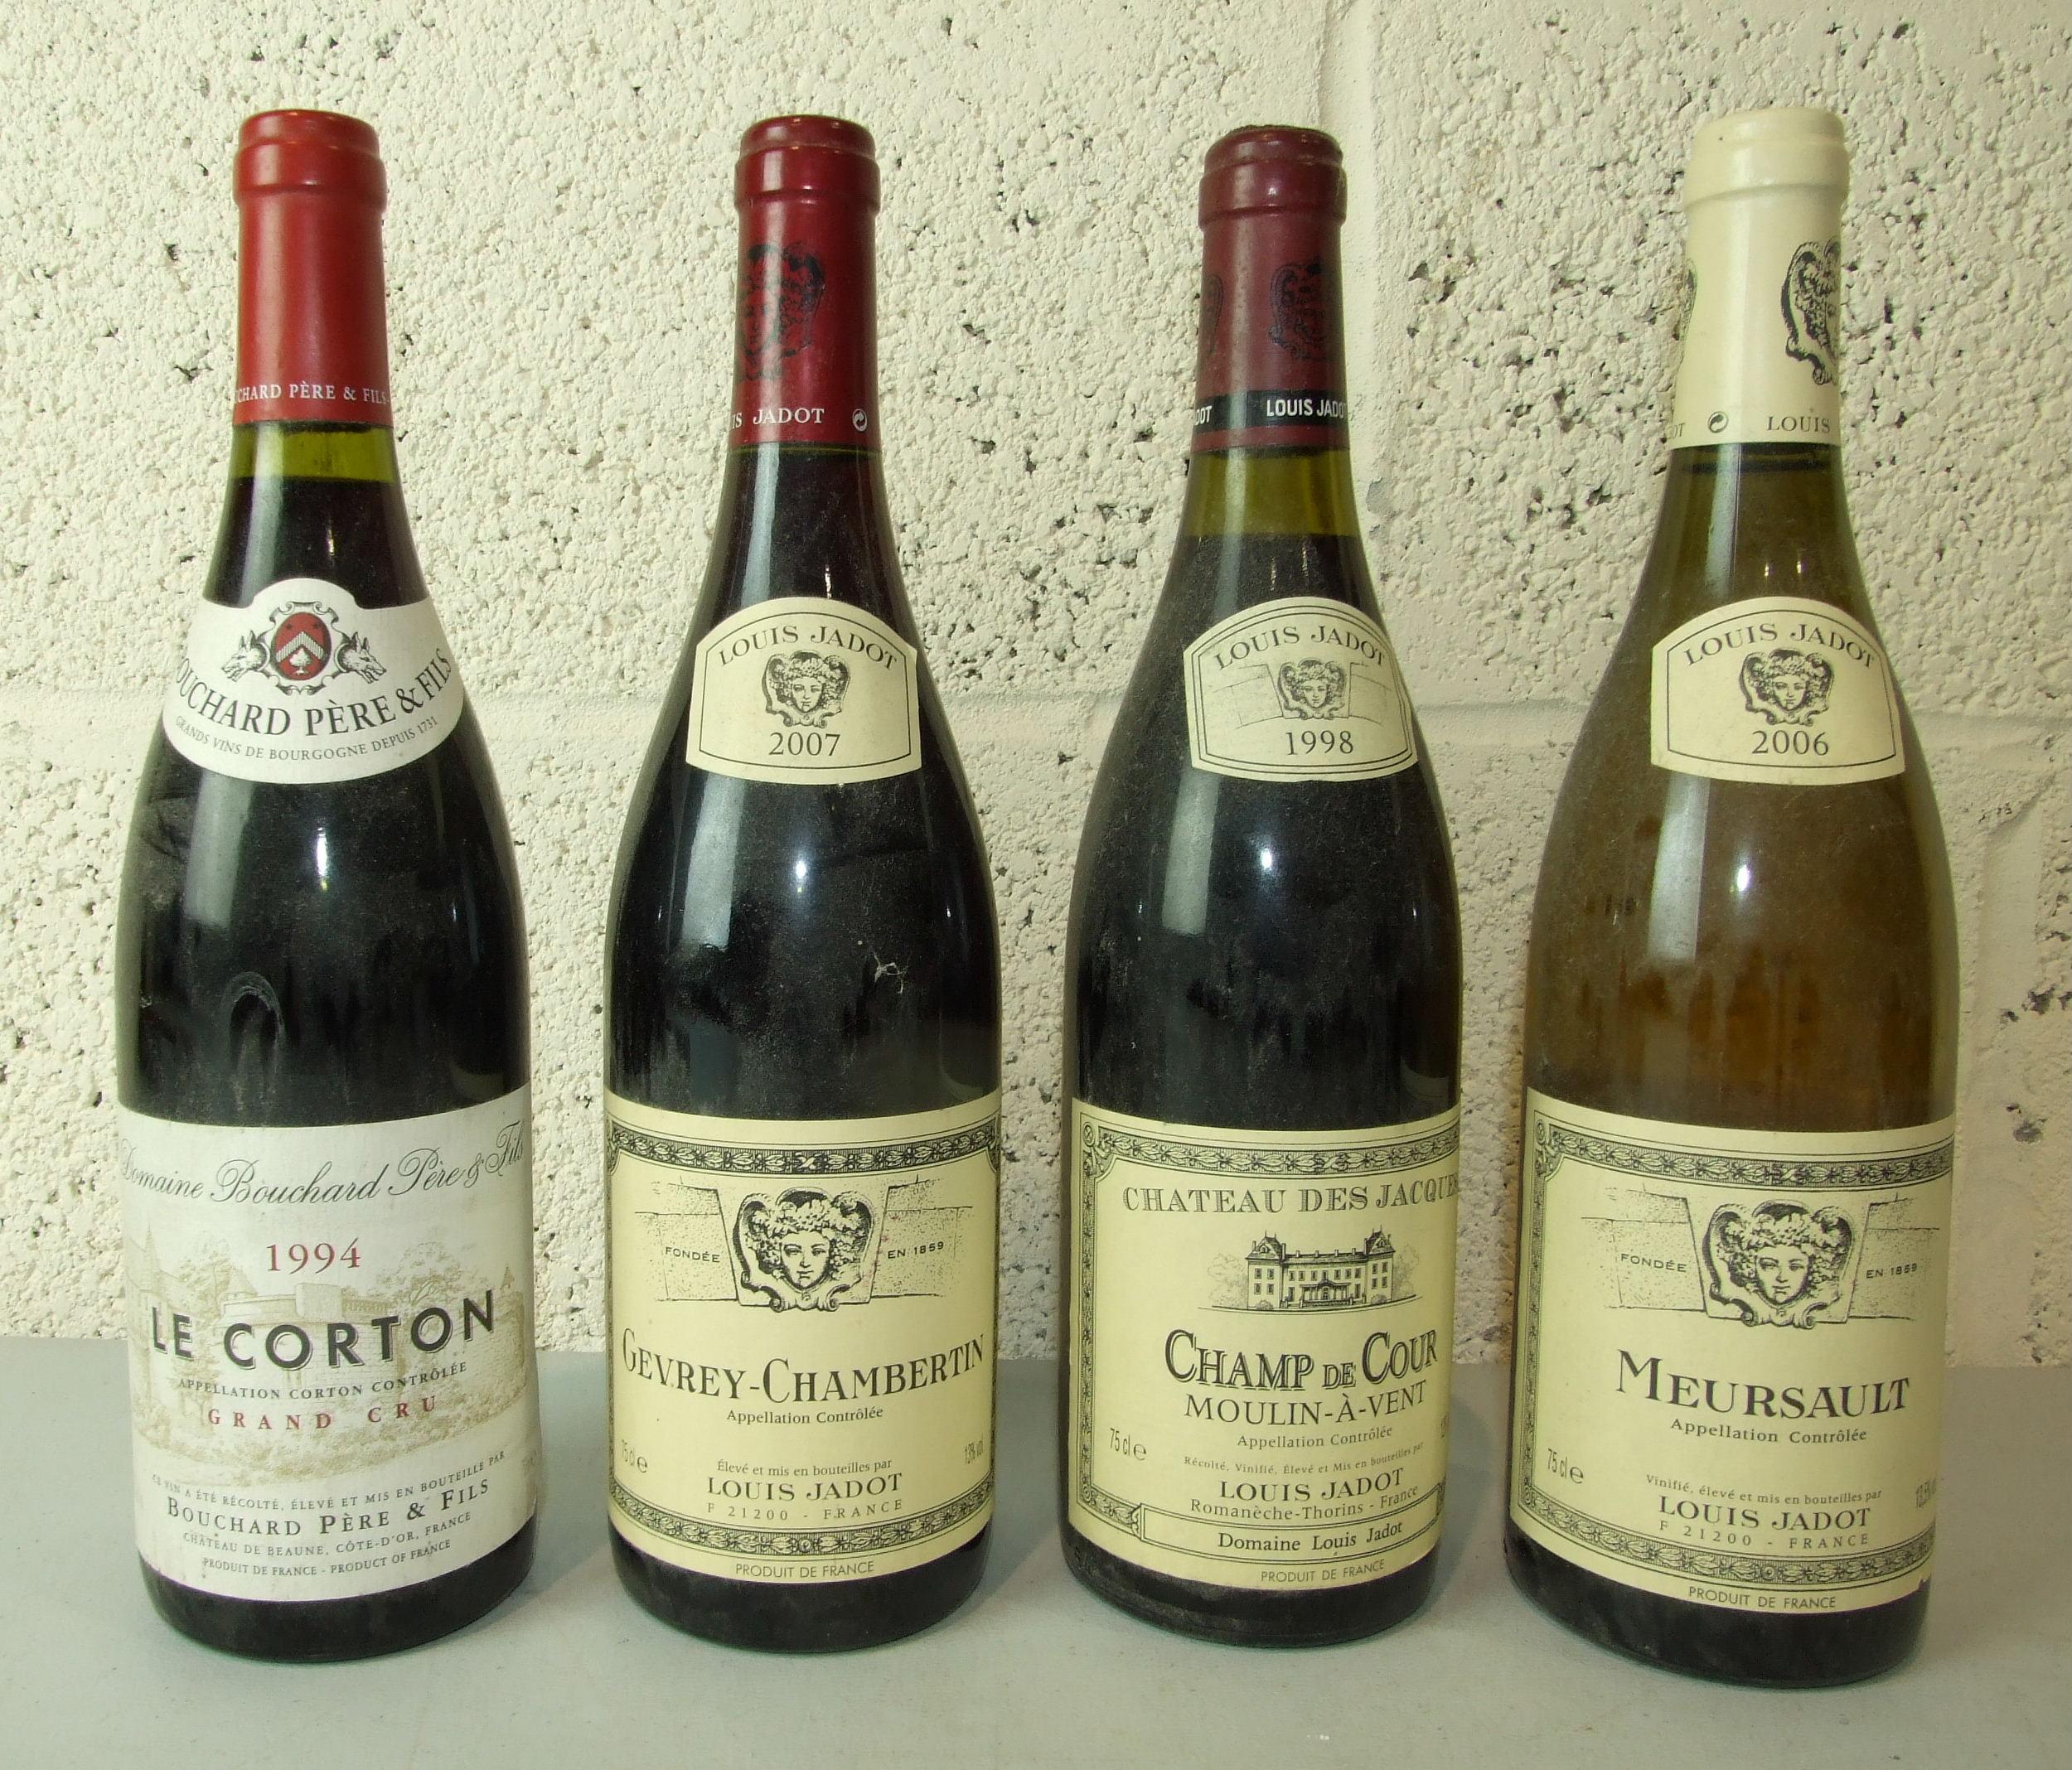 Lot 49 - France, Louis Jadot Gevrey-Chambertin 2007, one bottle; Bouchard Pere & Fils, Le Corton 1994, one